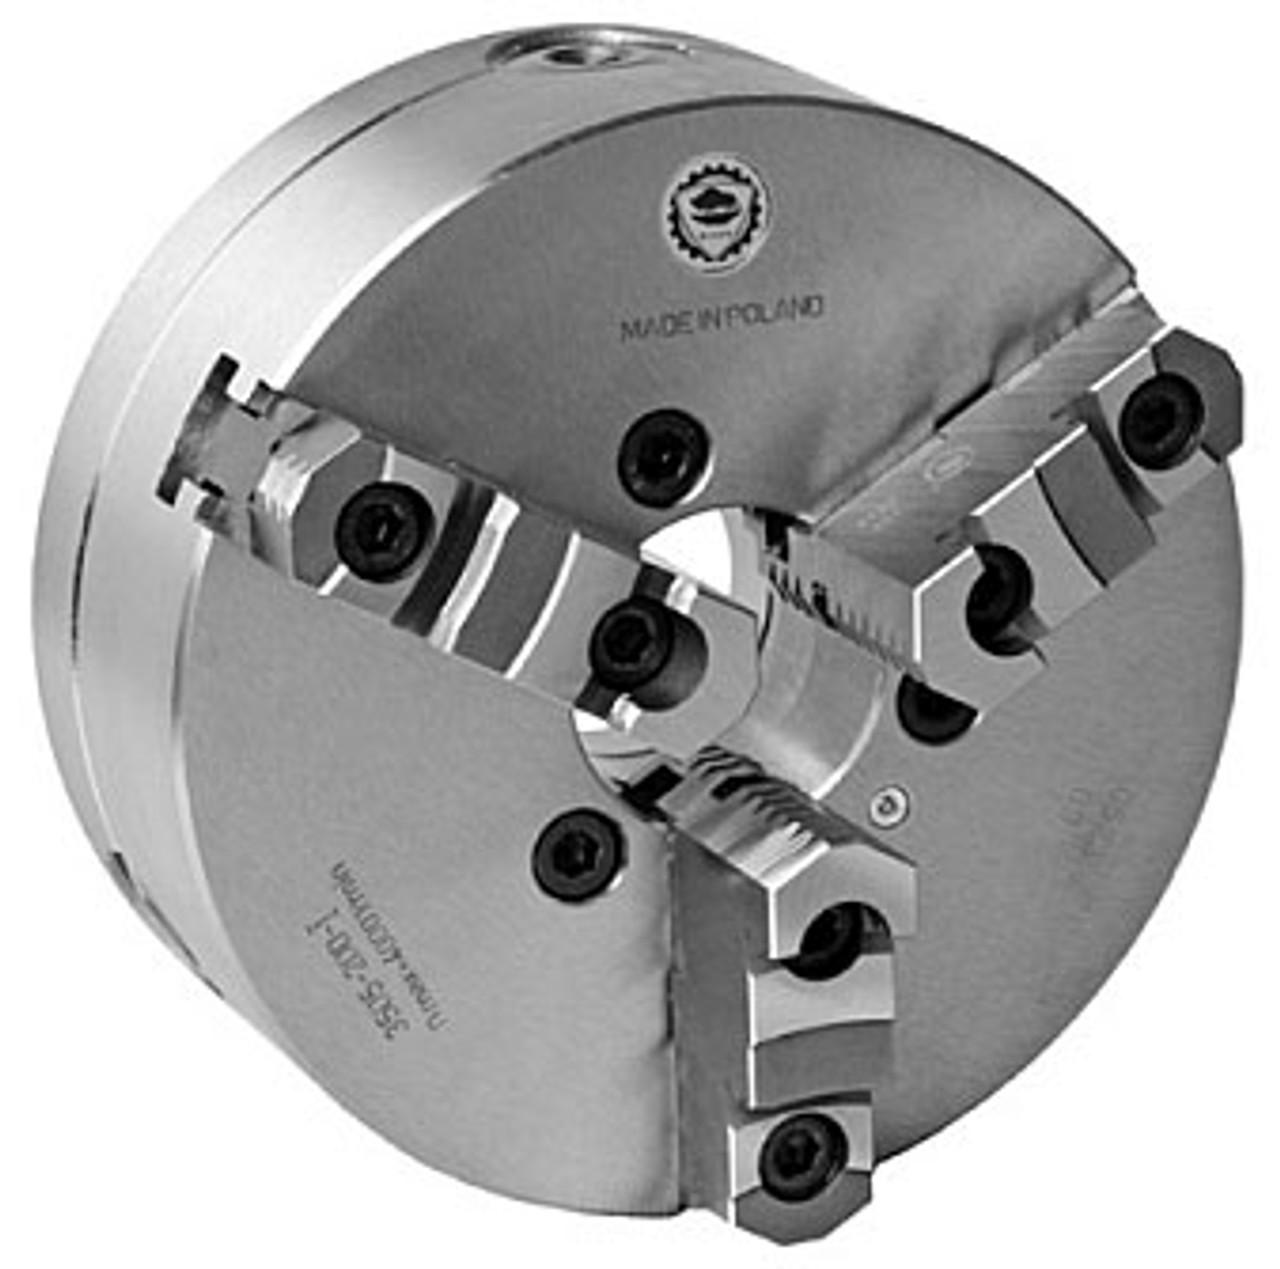 Location II-35. 3SE7 150-1BF000 3SE7150-1BF150 New Siemens Safety Switch